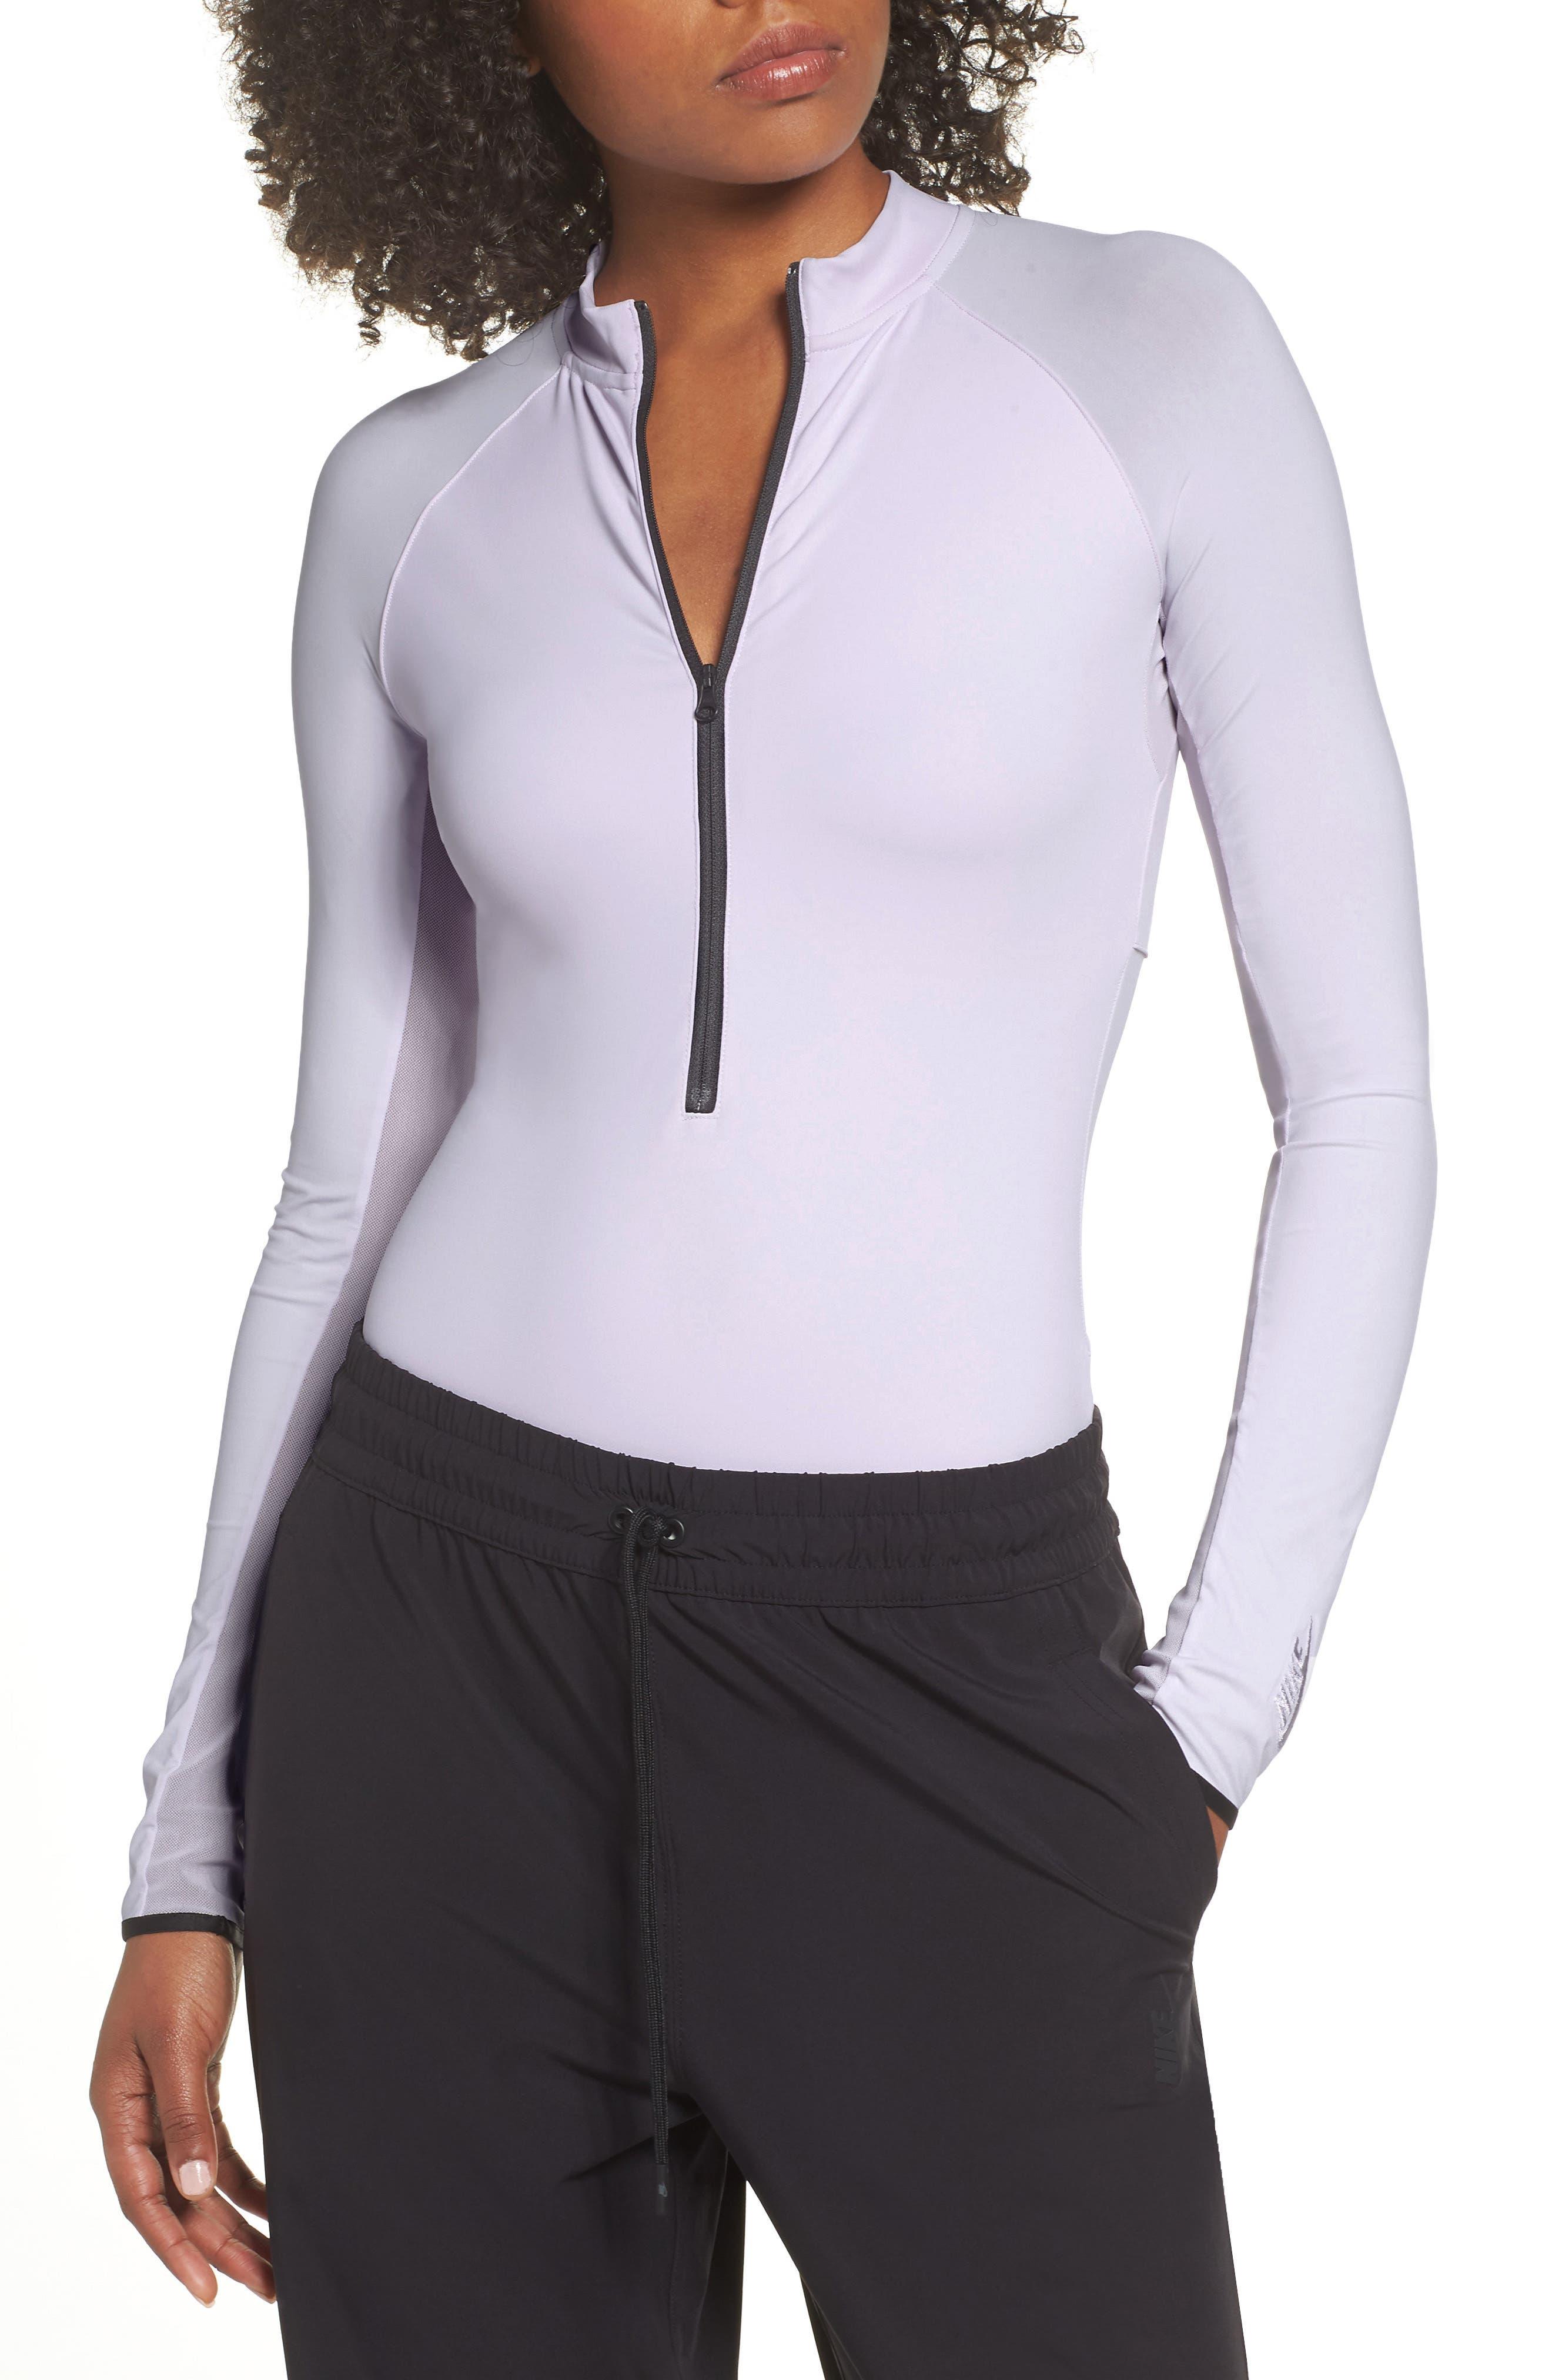 NRG Women's Dri-FIT Long Sleeve Bodysuit,                             Alternate thumbnail 2, color,                             509